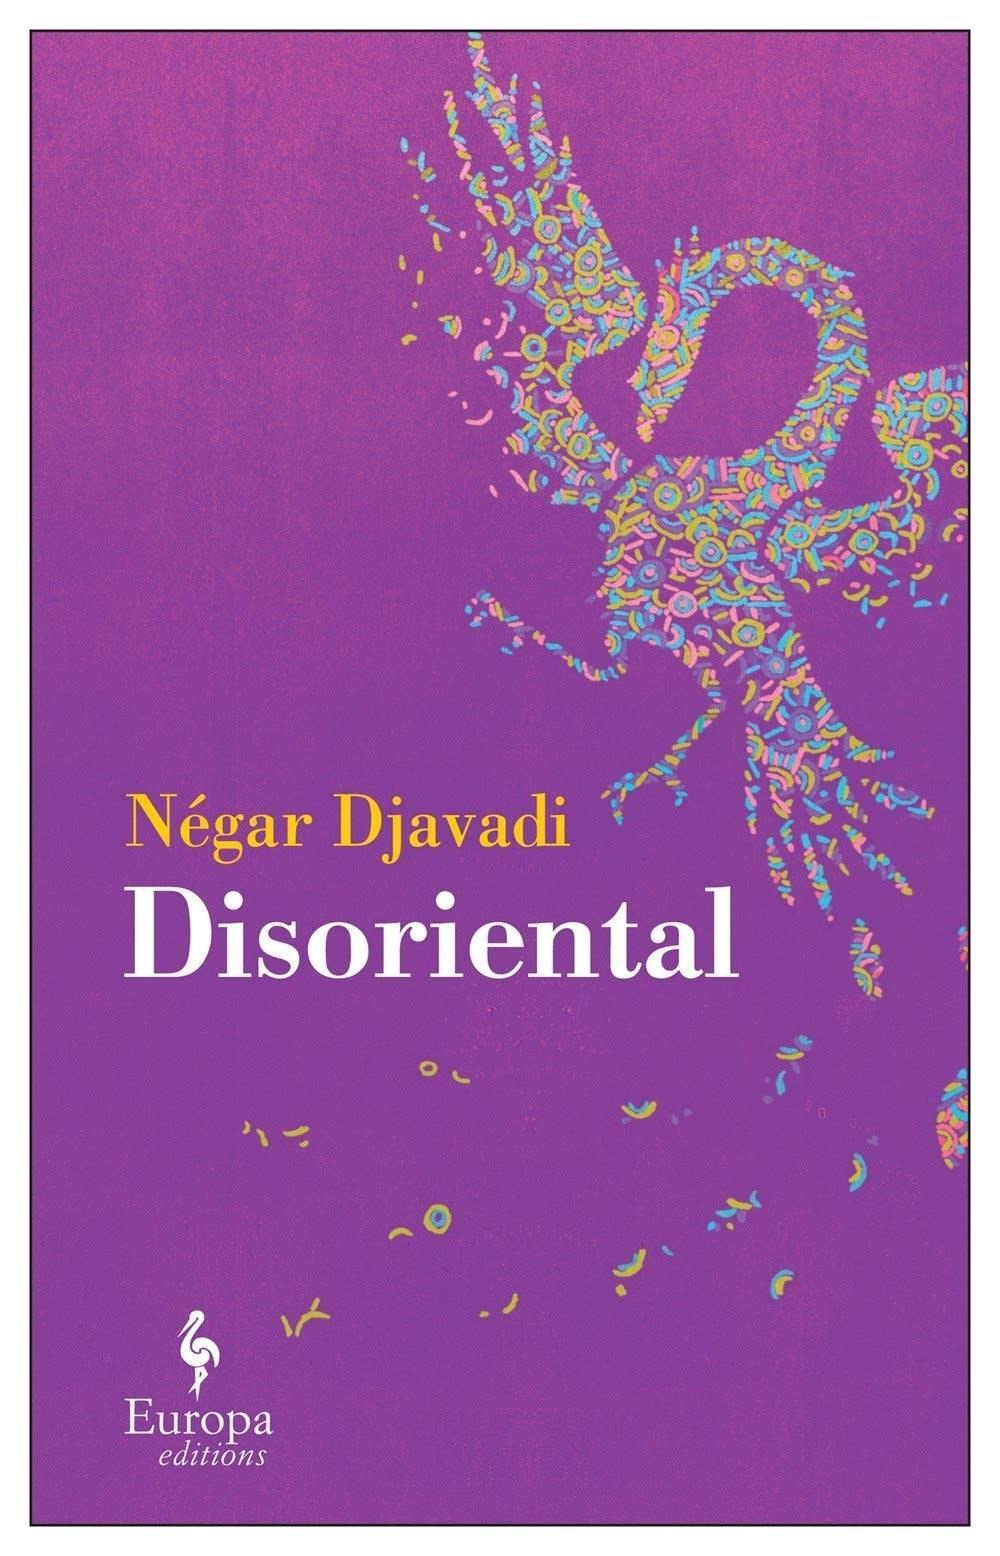 551706-20180413-disoriental.jpg